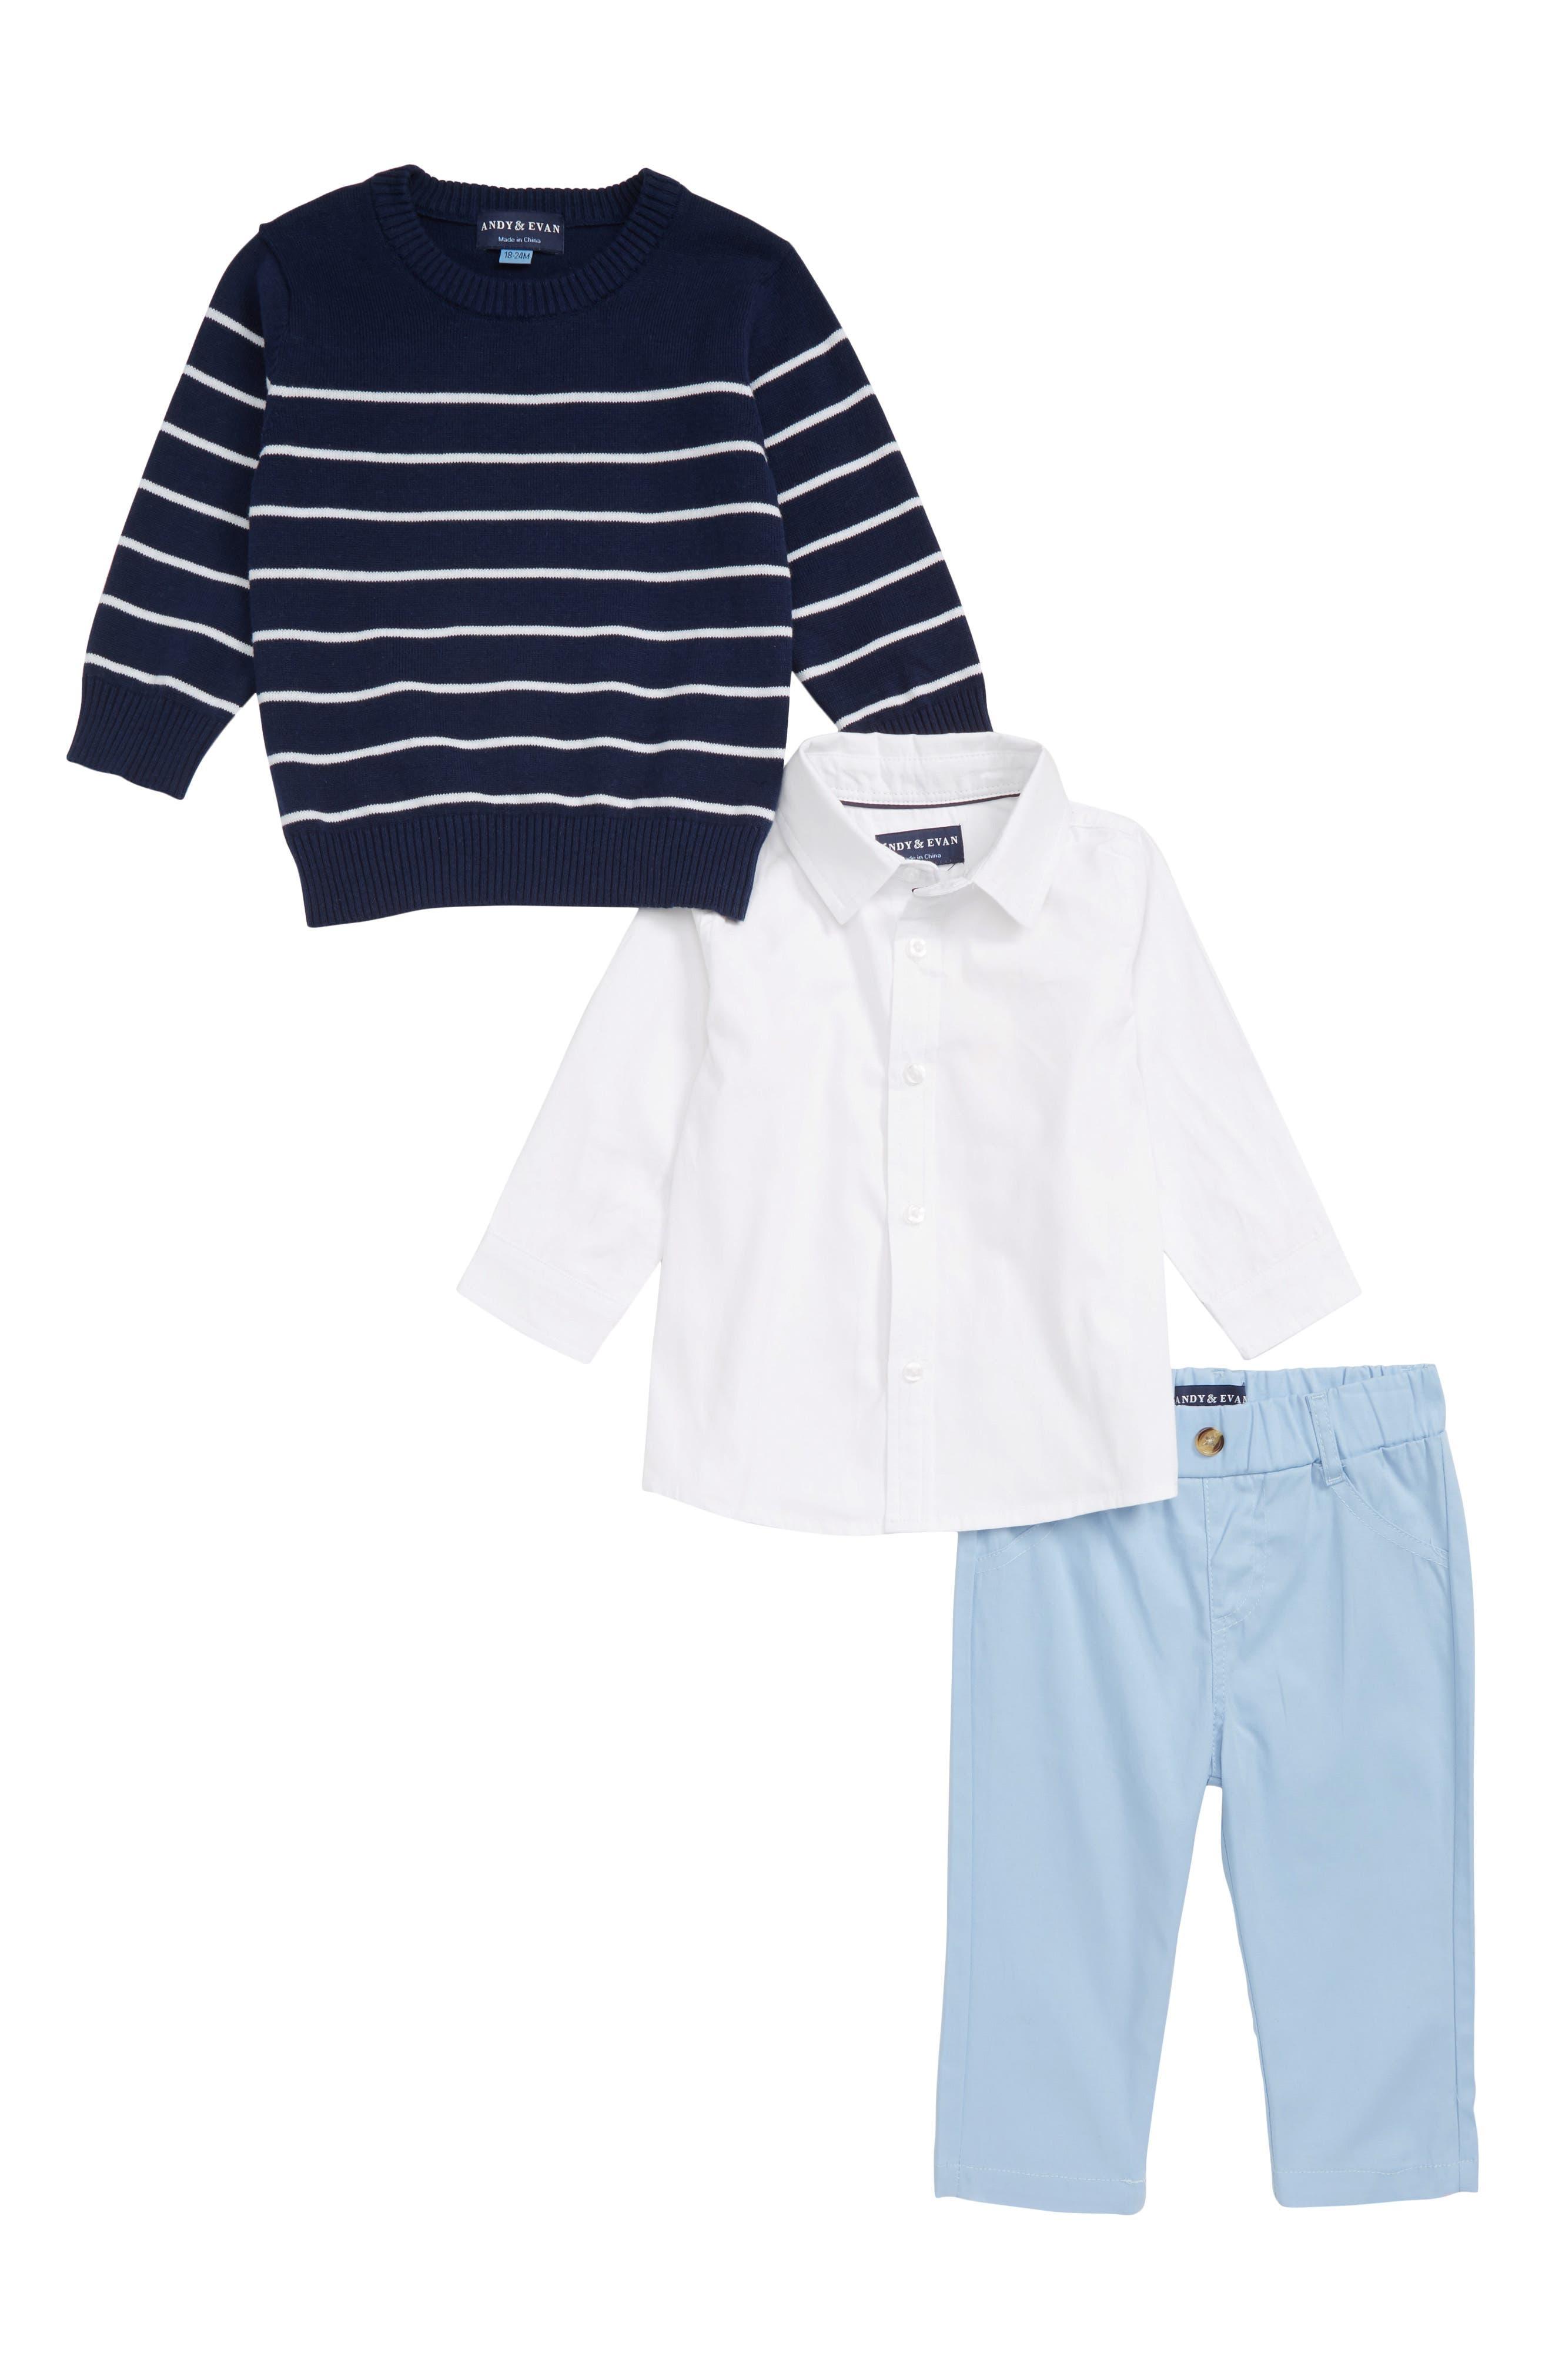 Infant Boys Andy  Evan Shirt Sweater  Pants Set